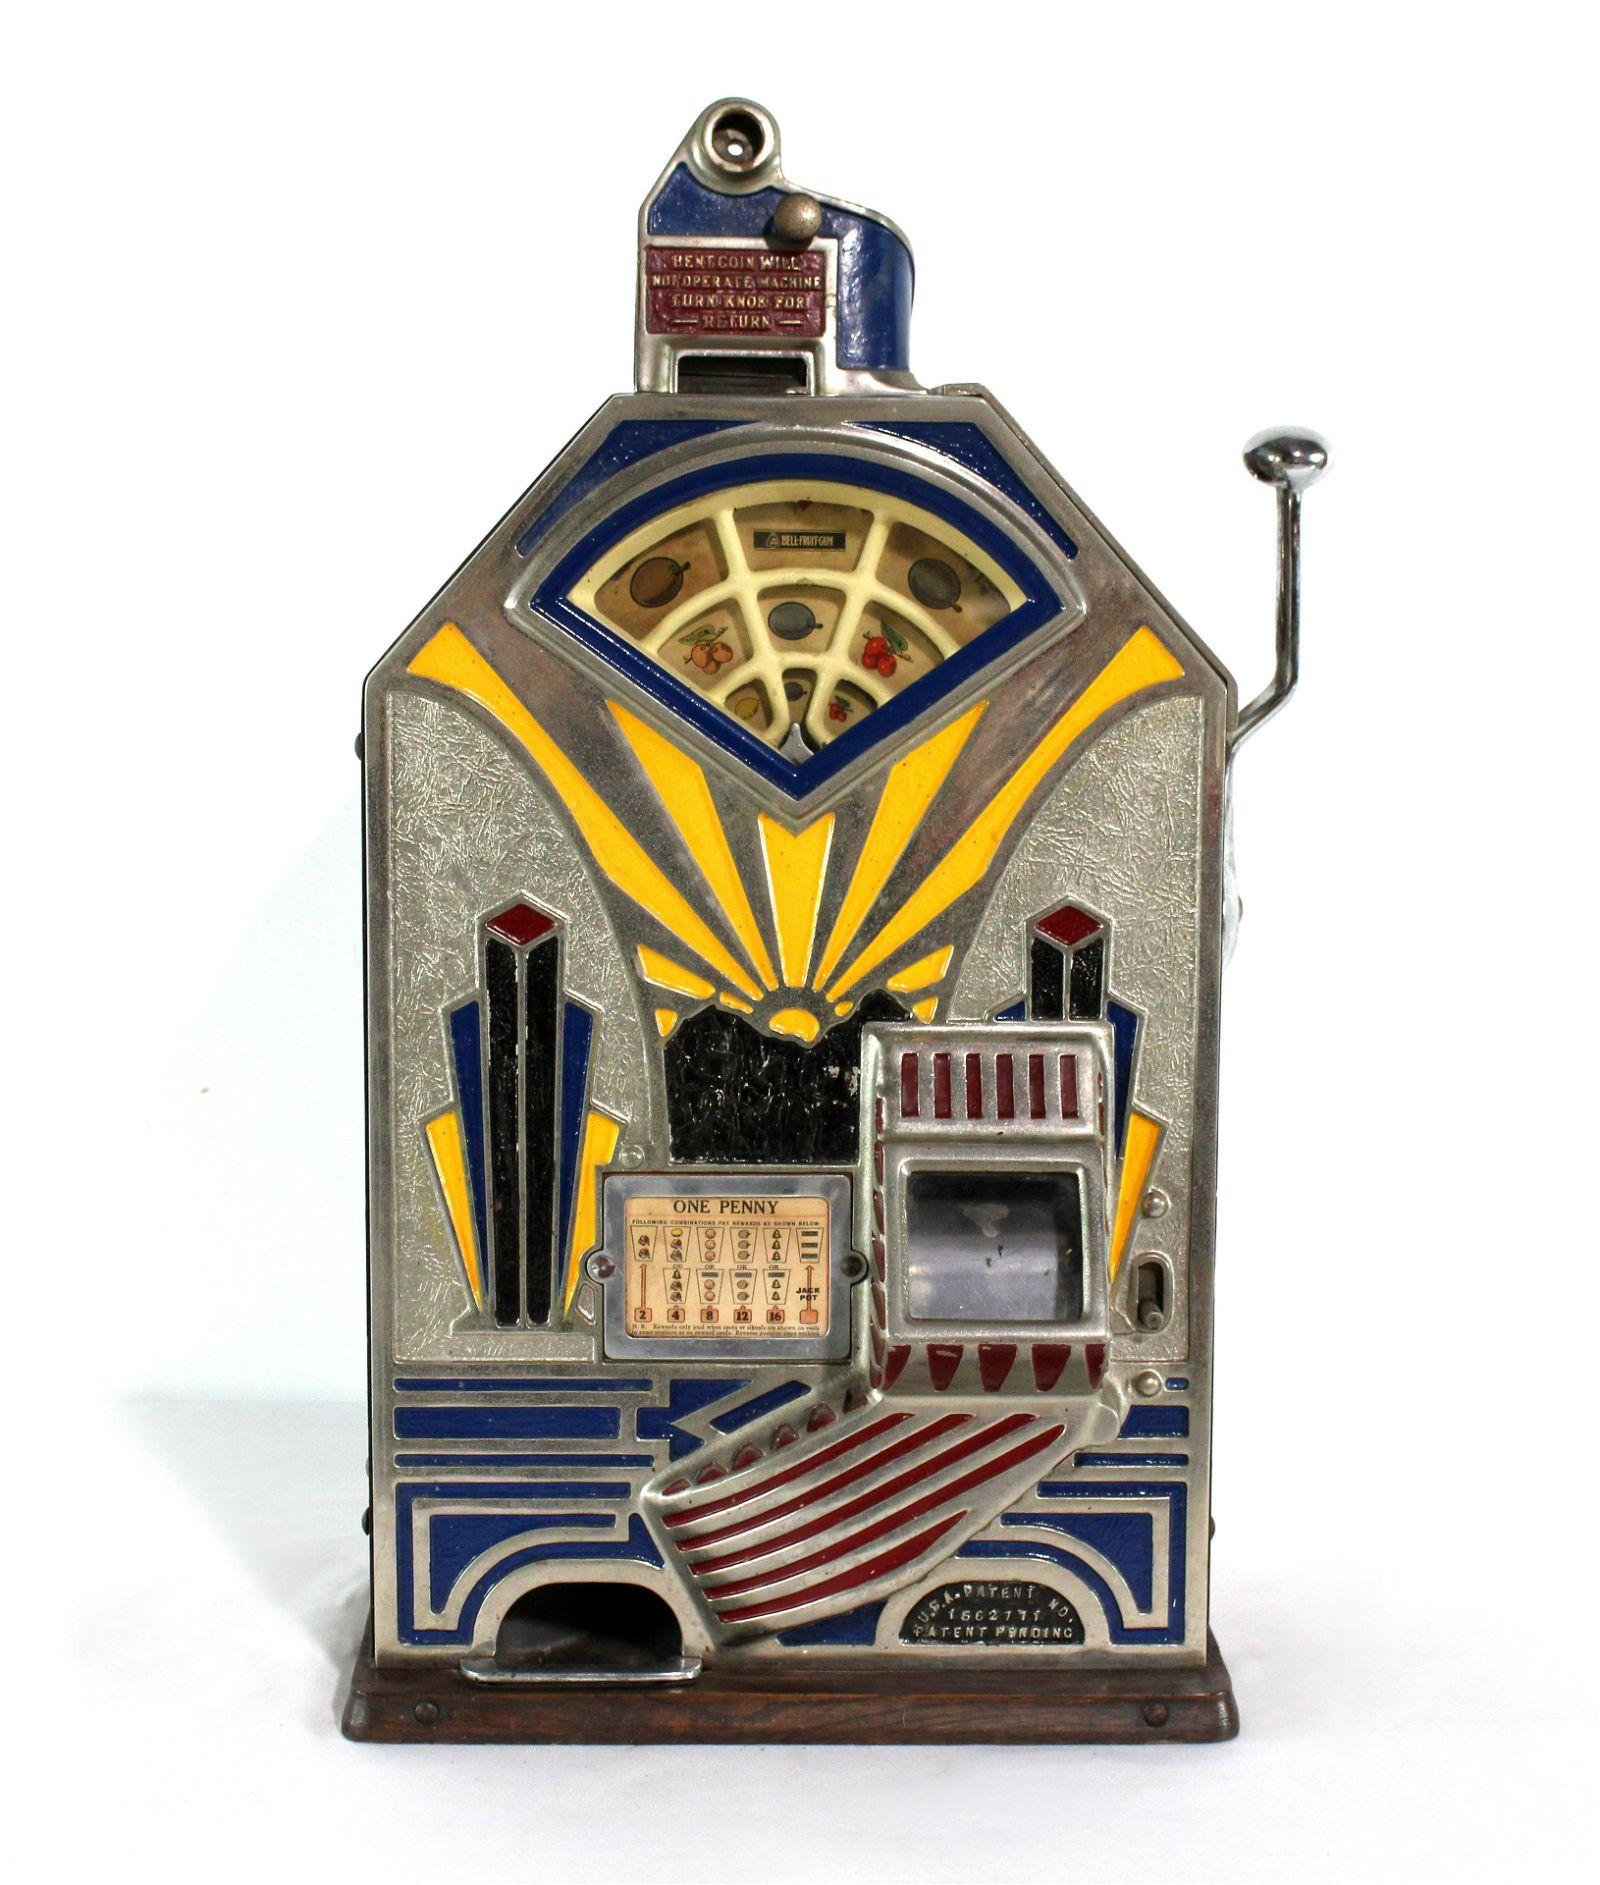 Little Duke Coin Operated Slot Machine